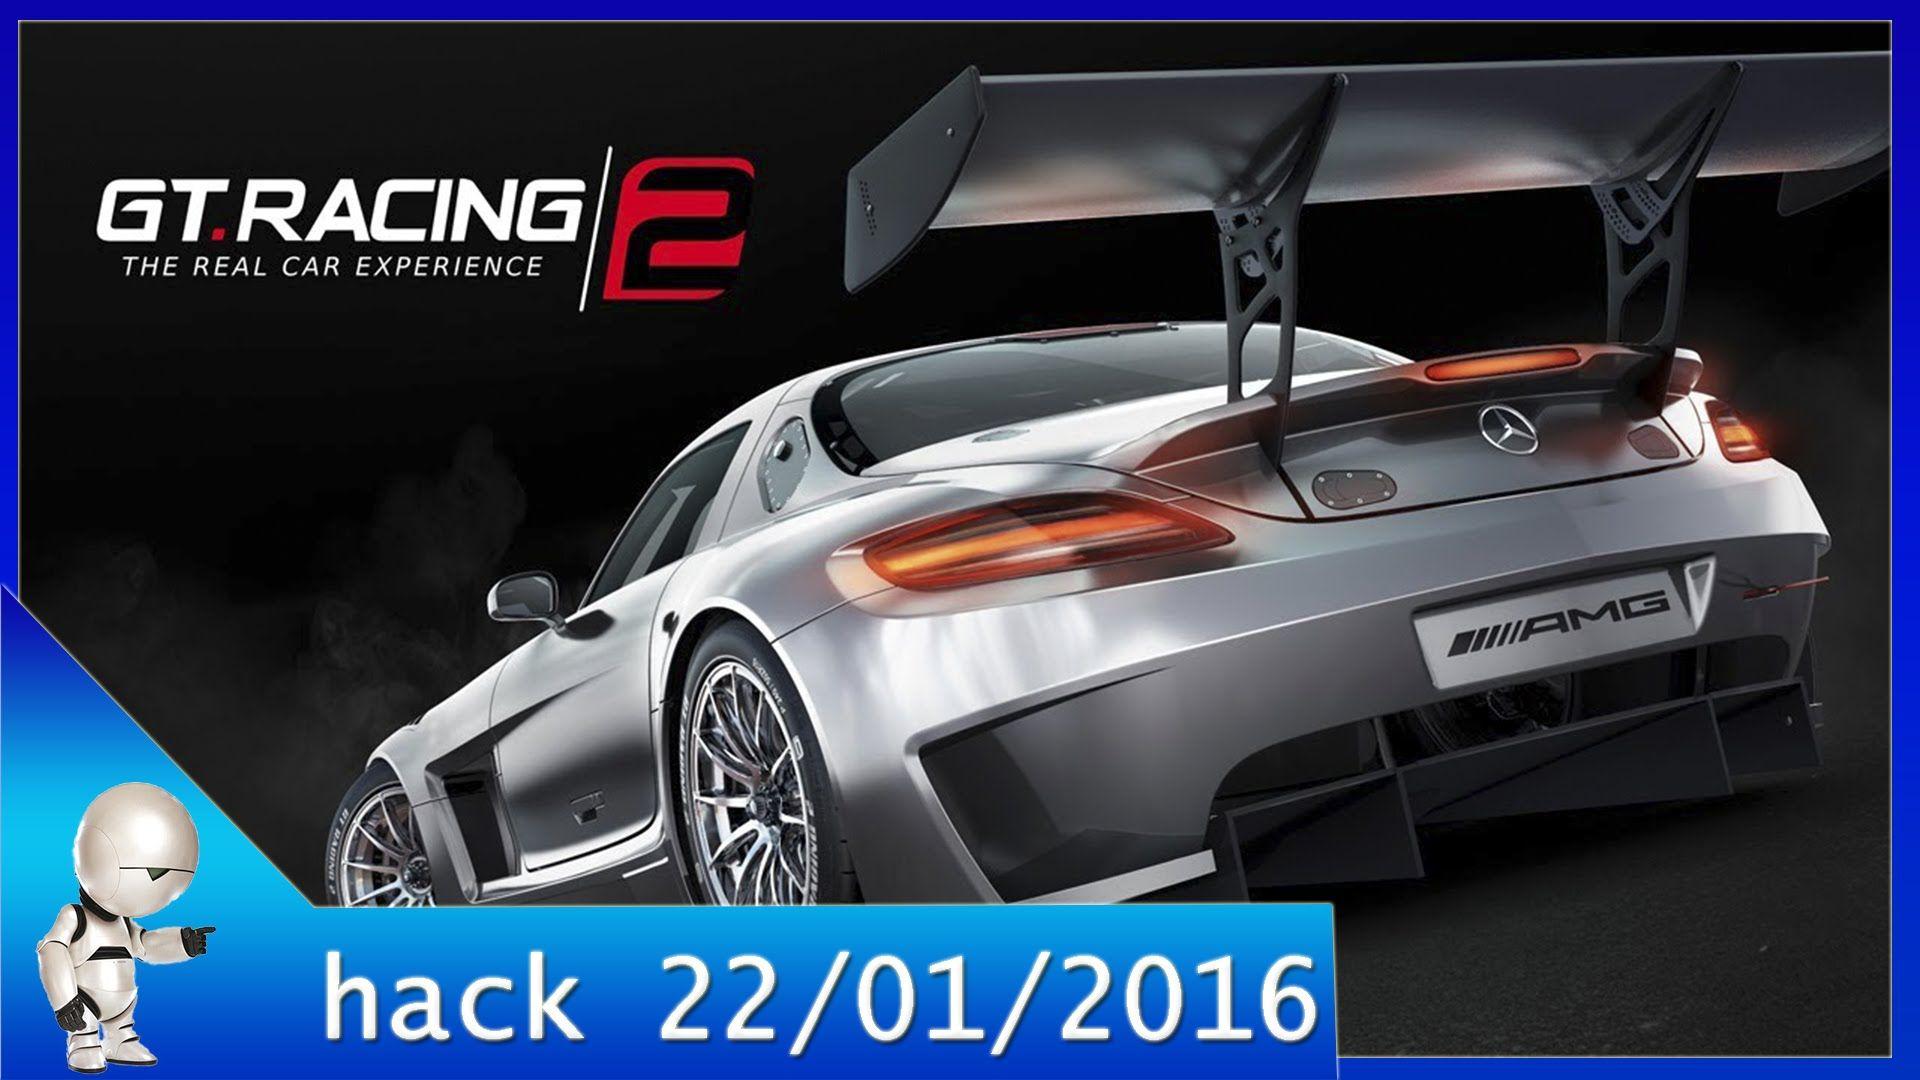 Hack Gt Racing 2 Pc Windows 8 8 1 10 Cheat Engine Com